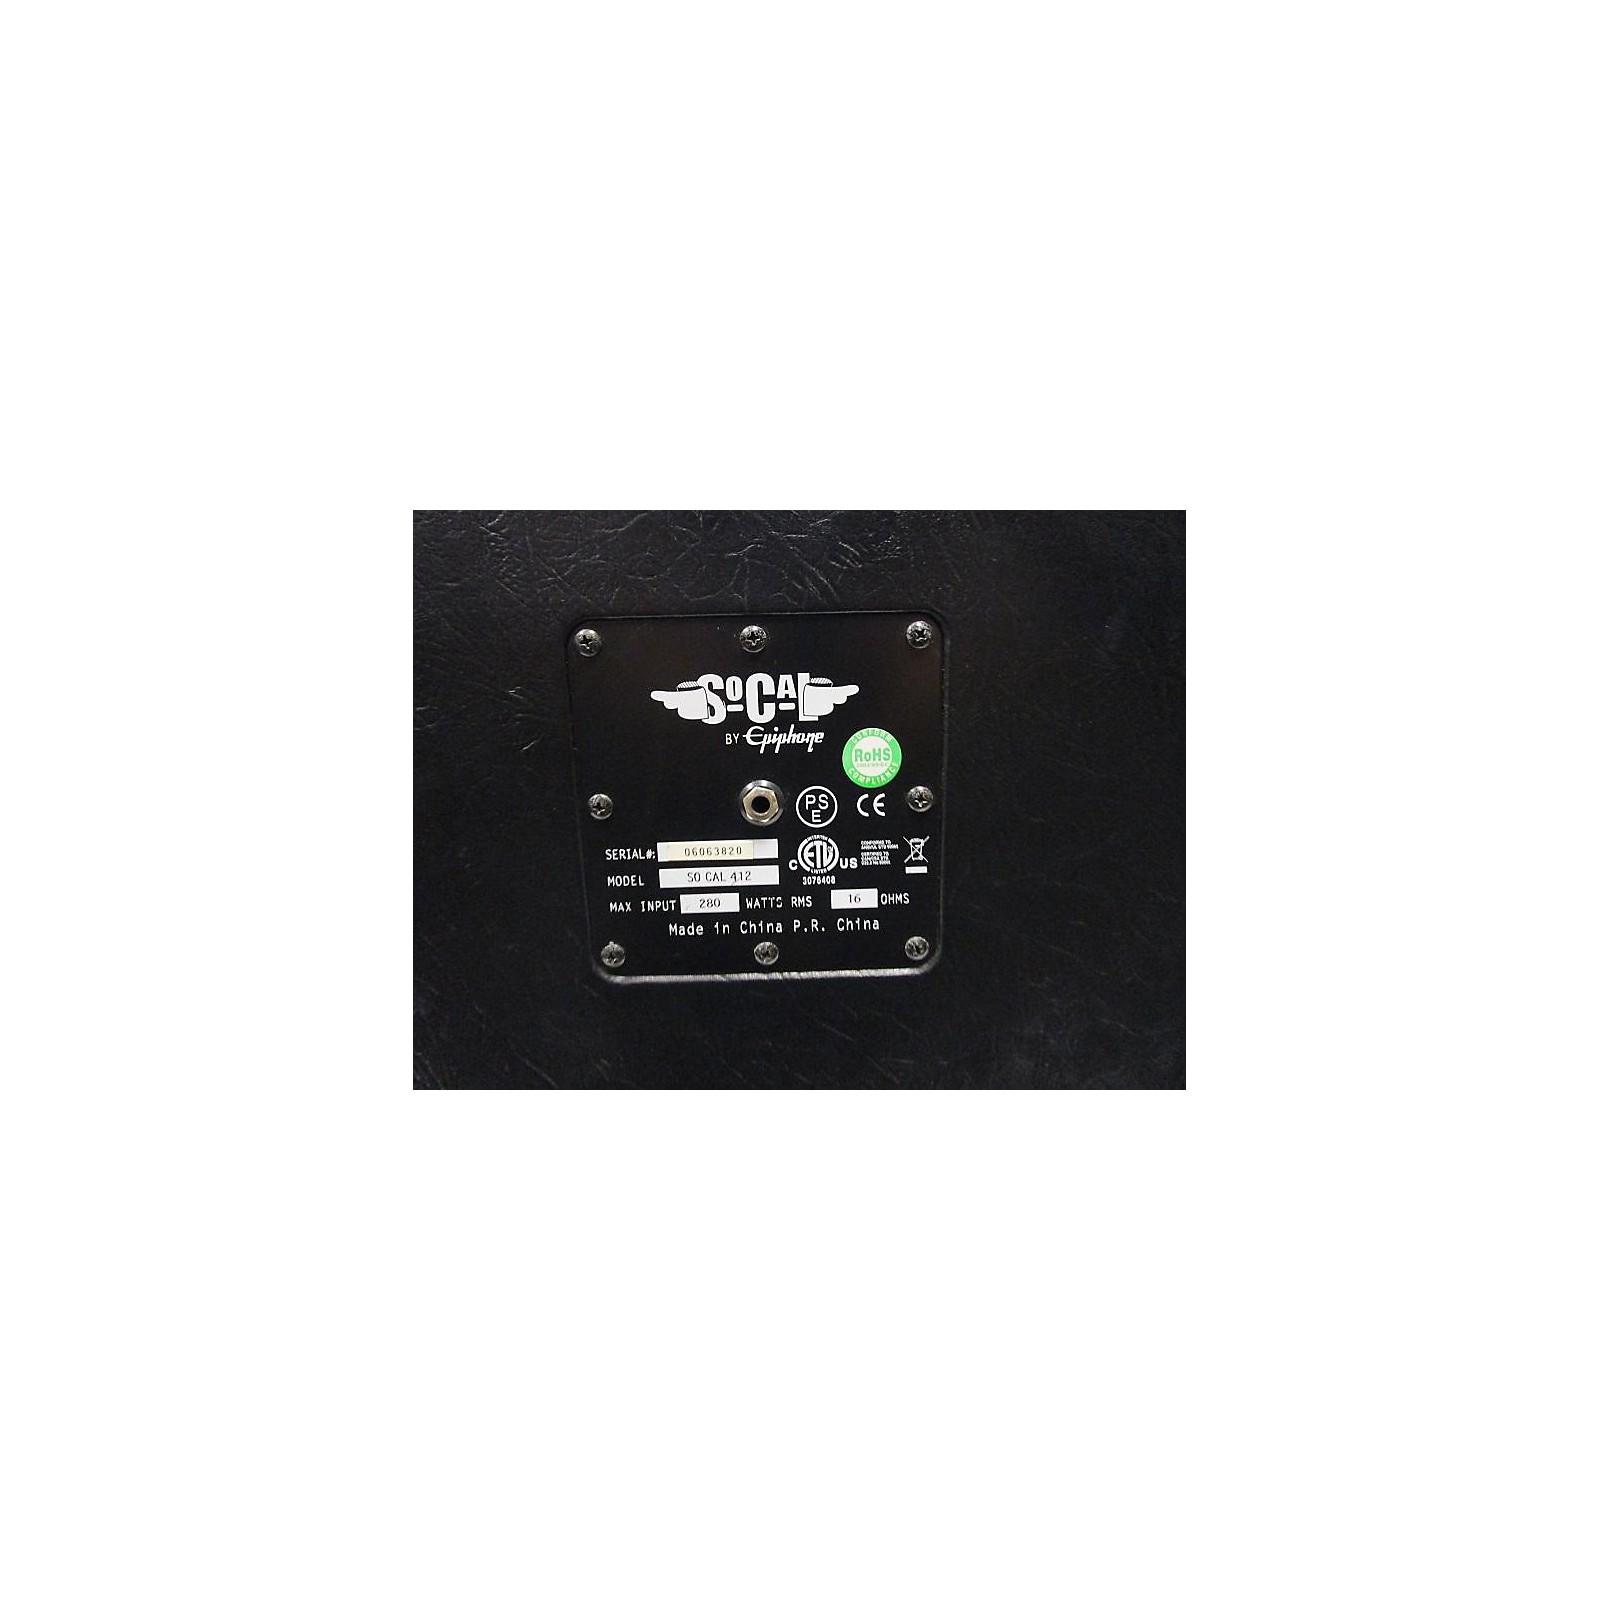 Epiphone SOCAL 4x12 Guitar Cabinet